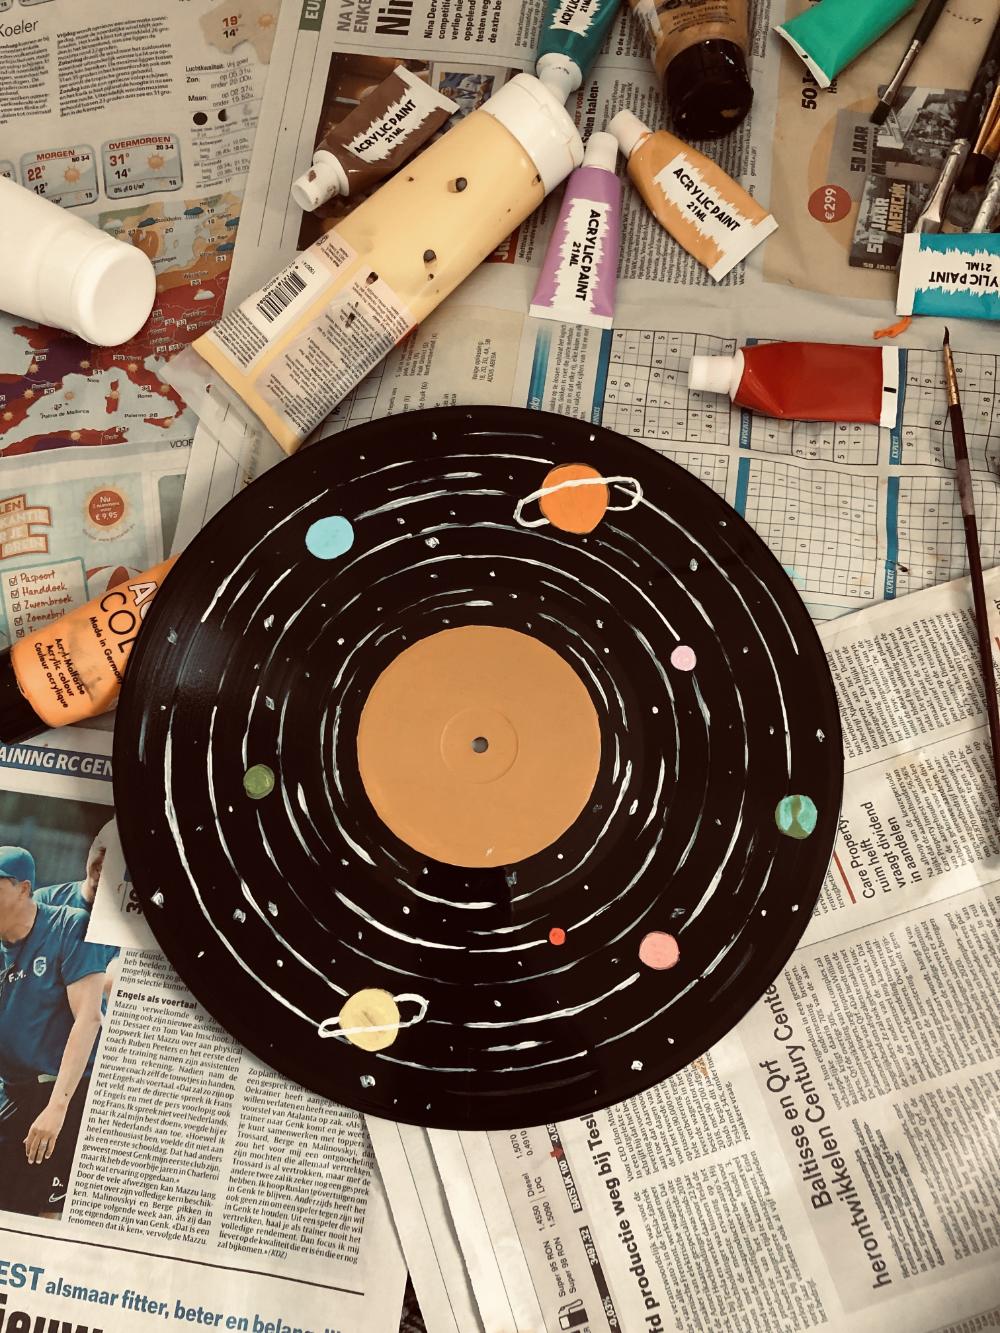 Aesthetic Painted Vinyl In 2020 Vinyl Painted Record Wall Art Vinyl Art Paint